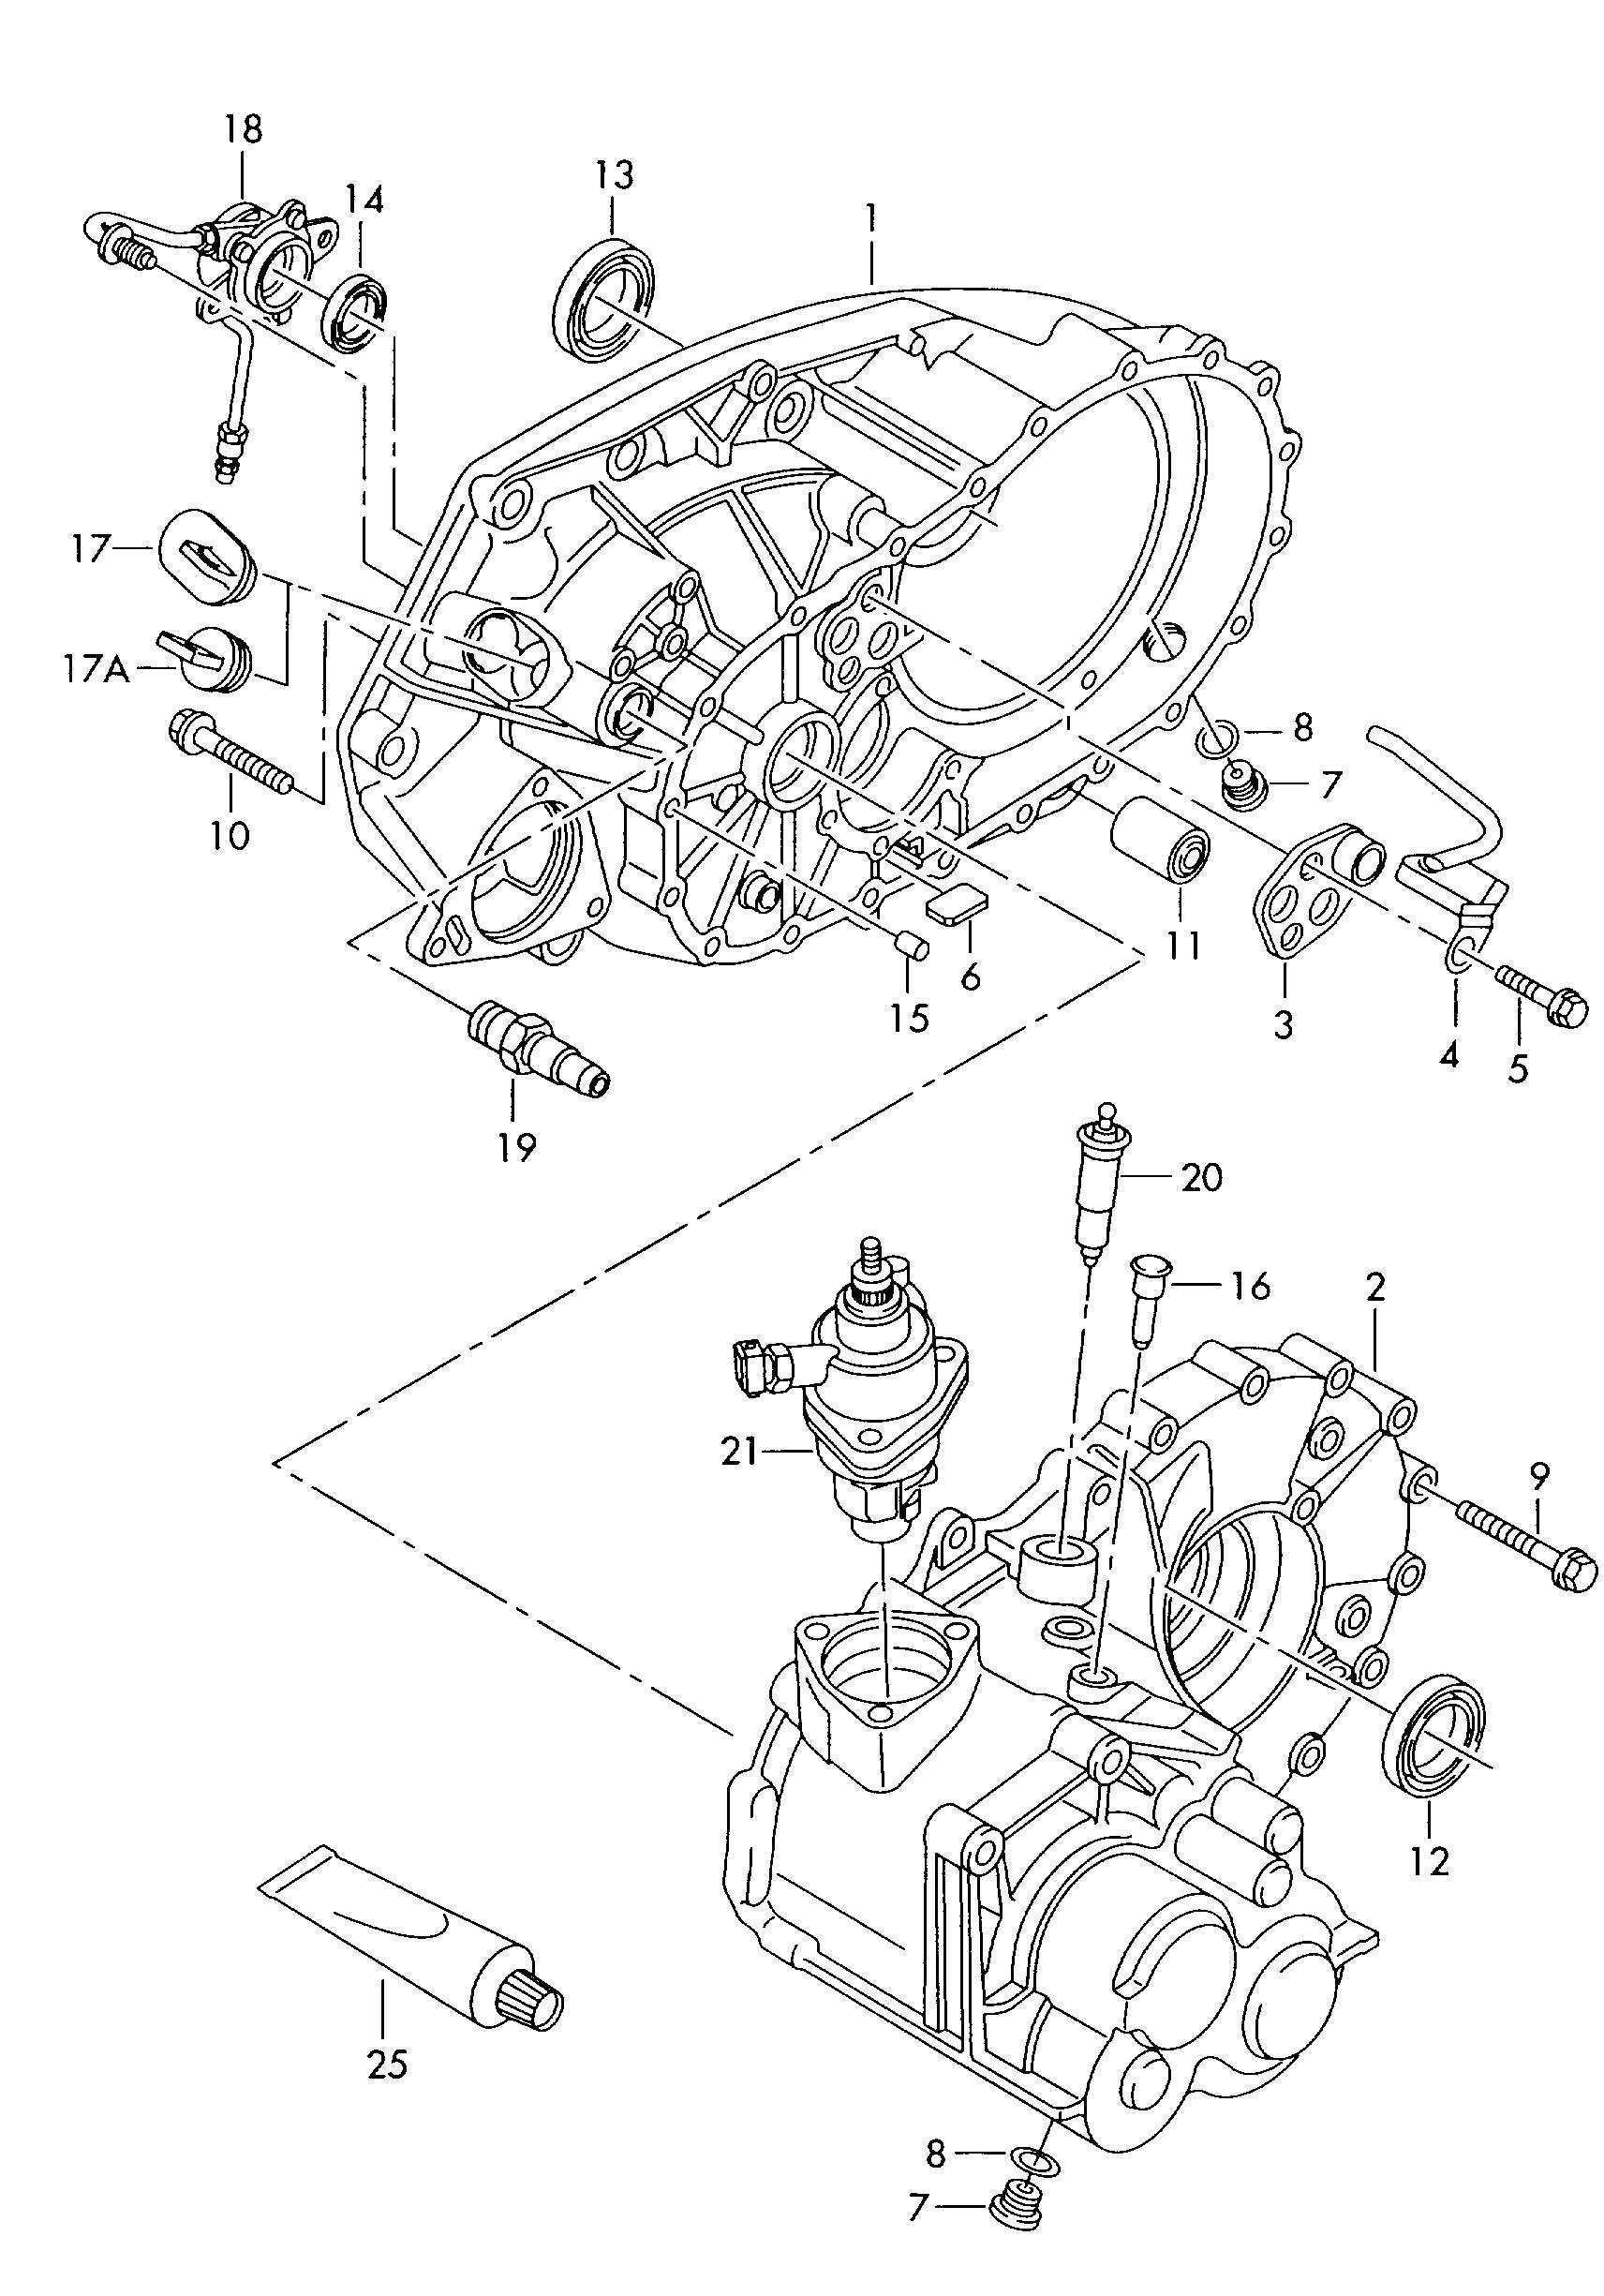 Volkswagen Eurovan Valve Unit Pressure Hose Illustration